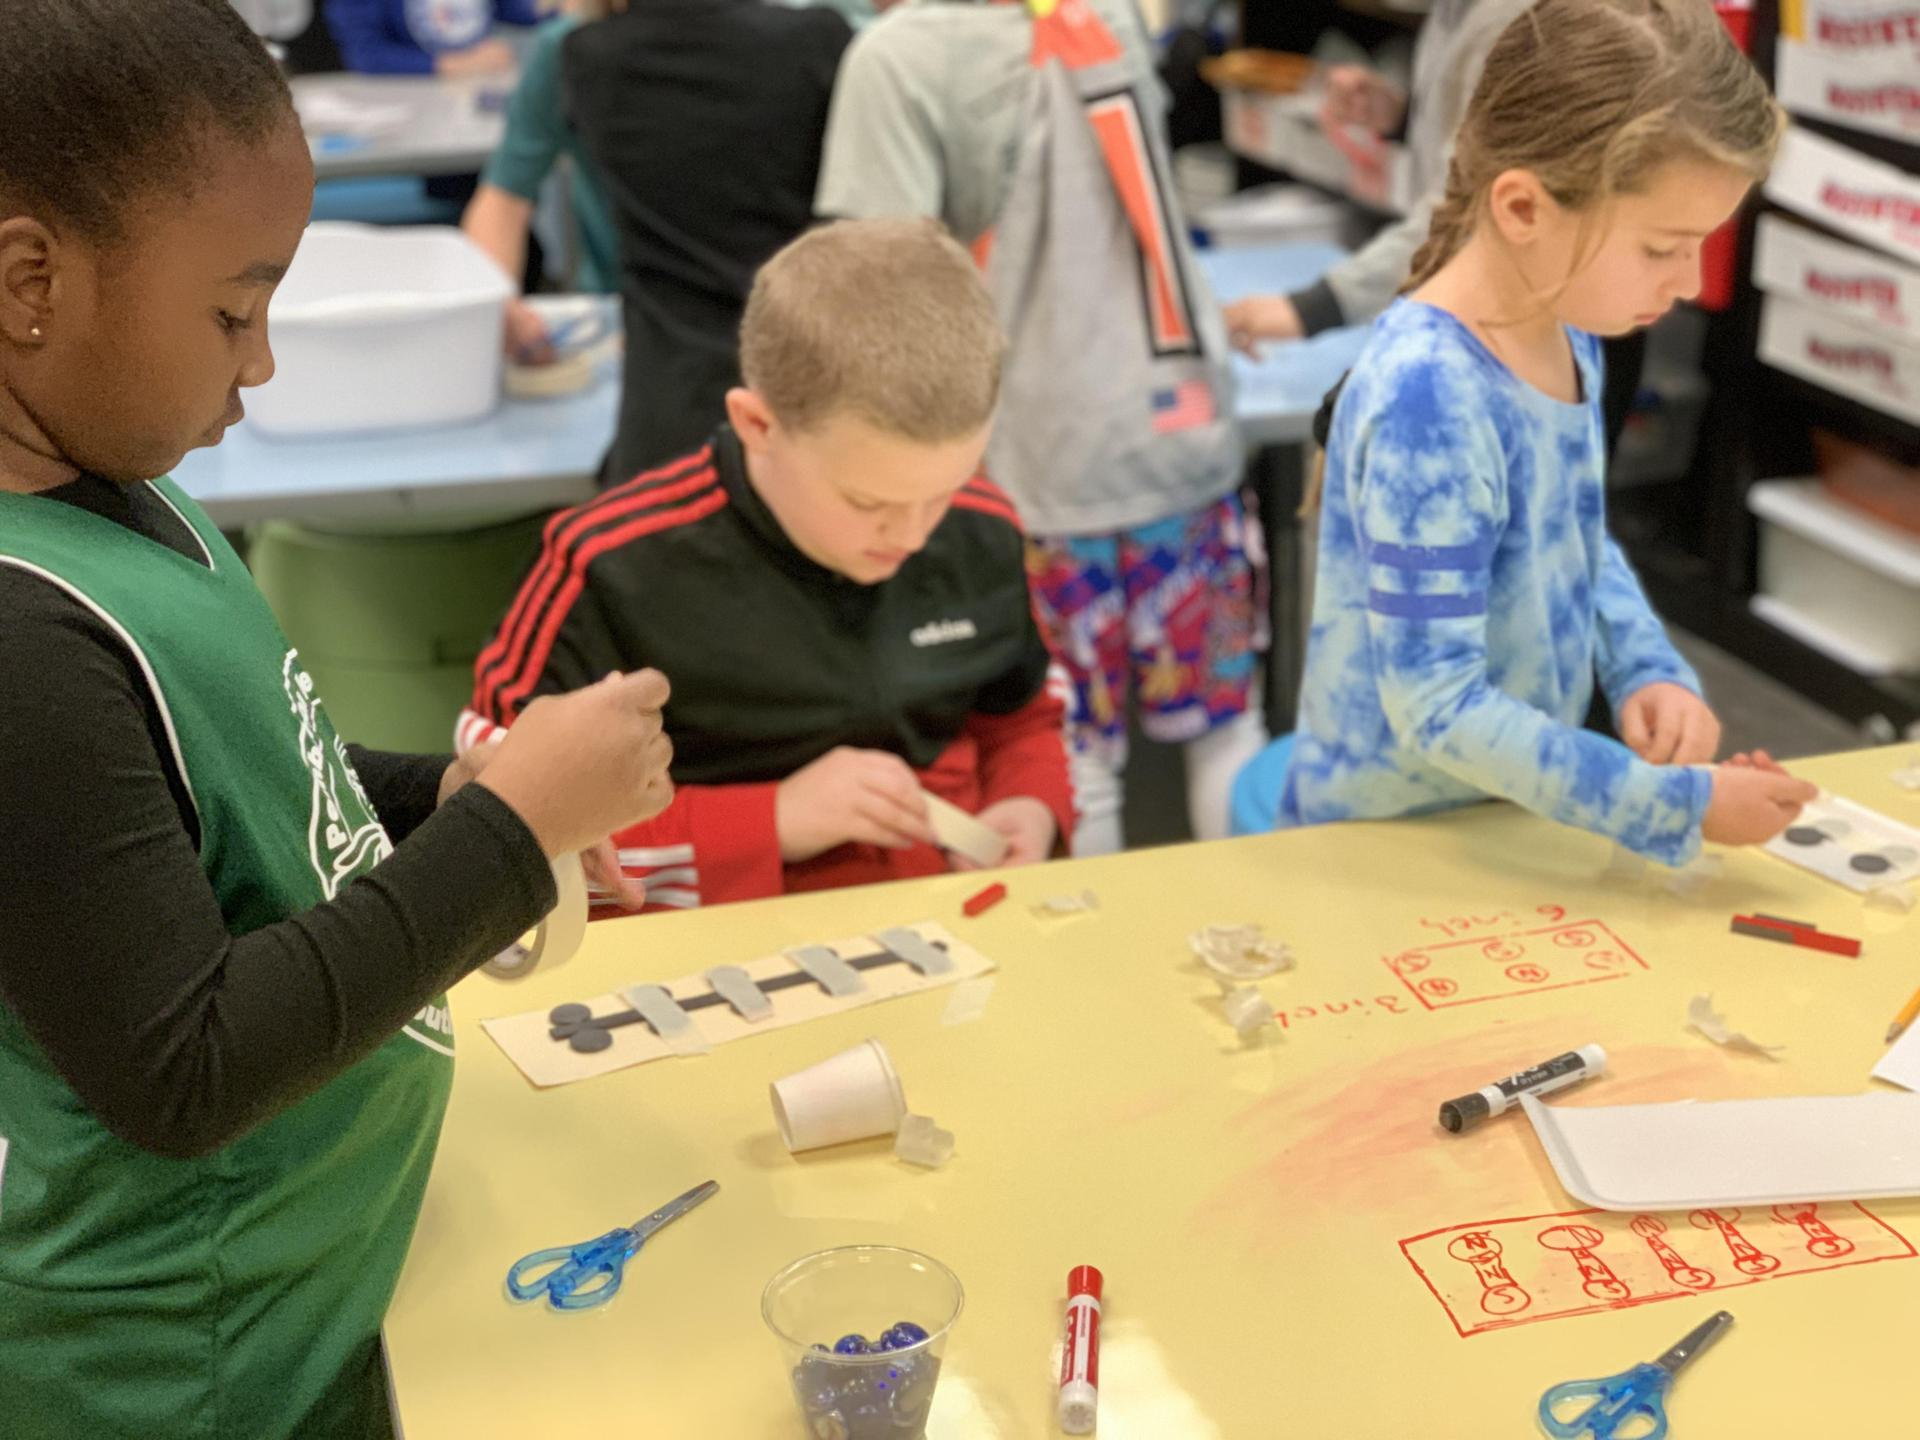 kids working together